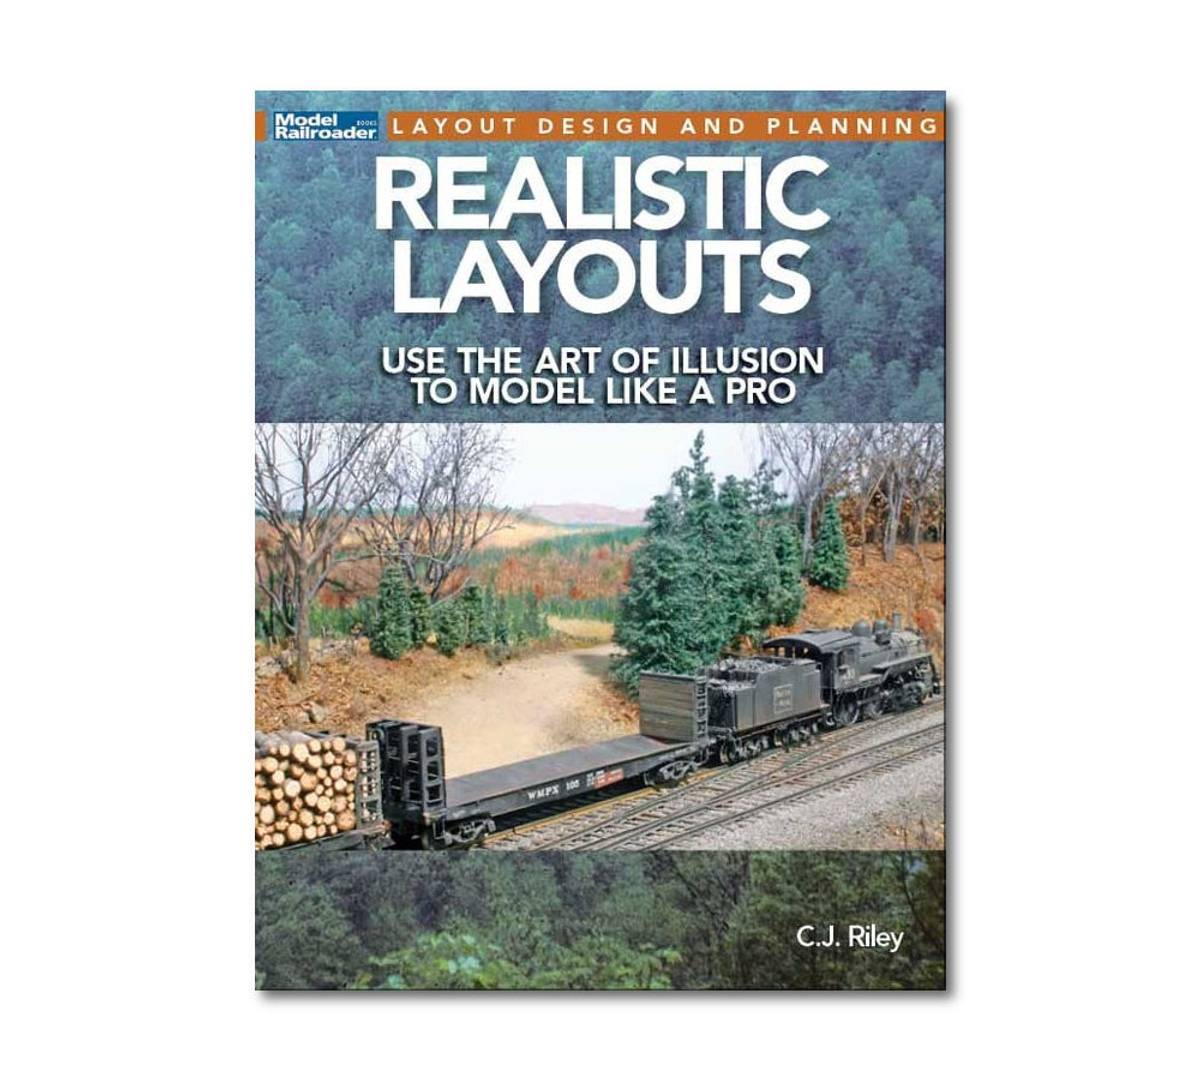 Realistic Layouts - C.J.Riley